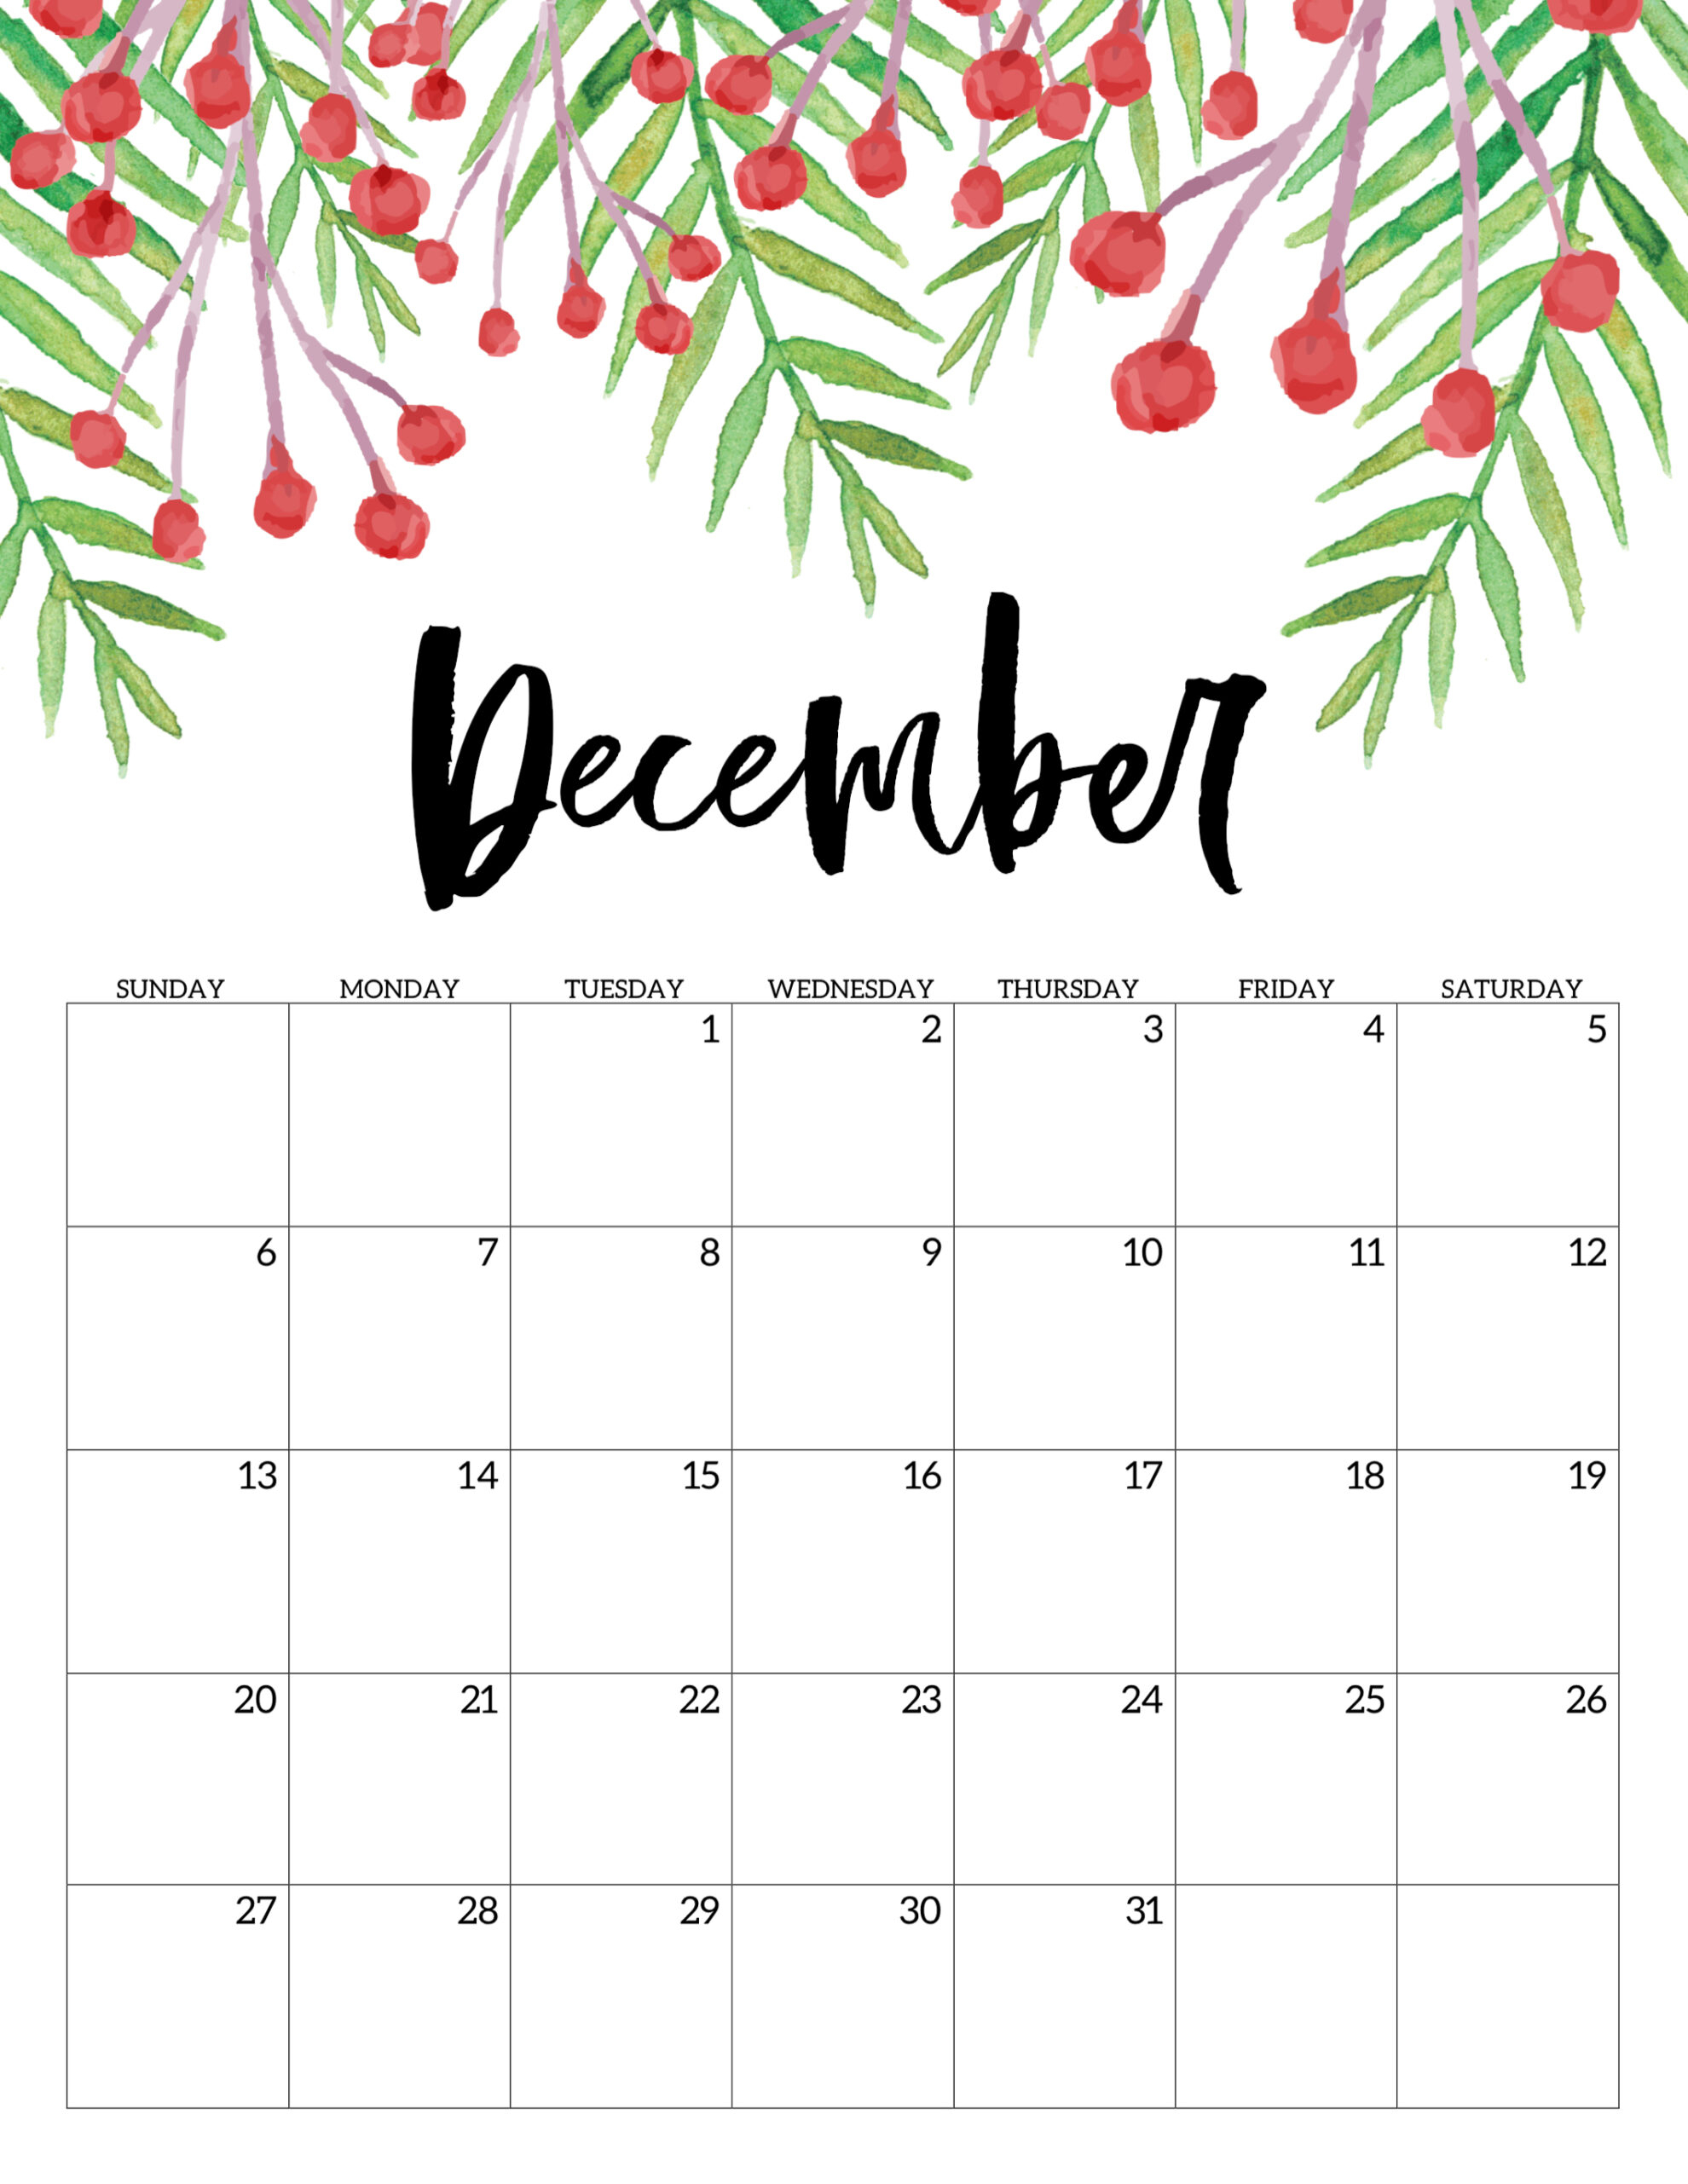 Free Printable Calendar 2020  Floral  Paper Trail Design in December Calendar 2020 Pinterest